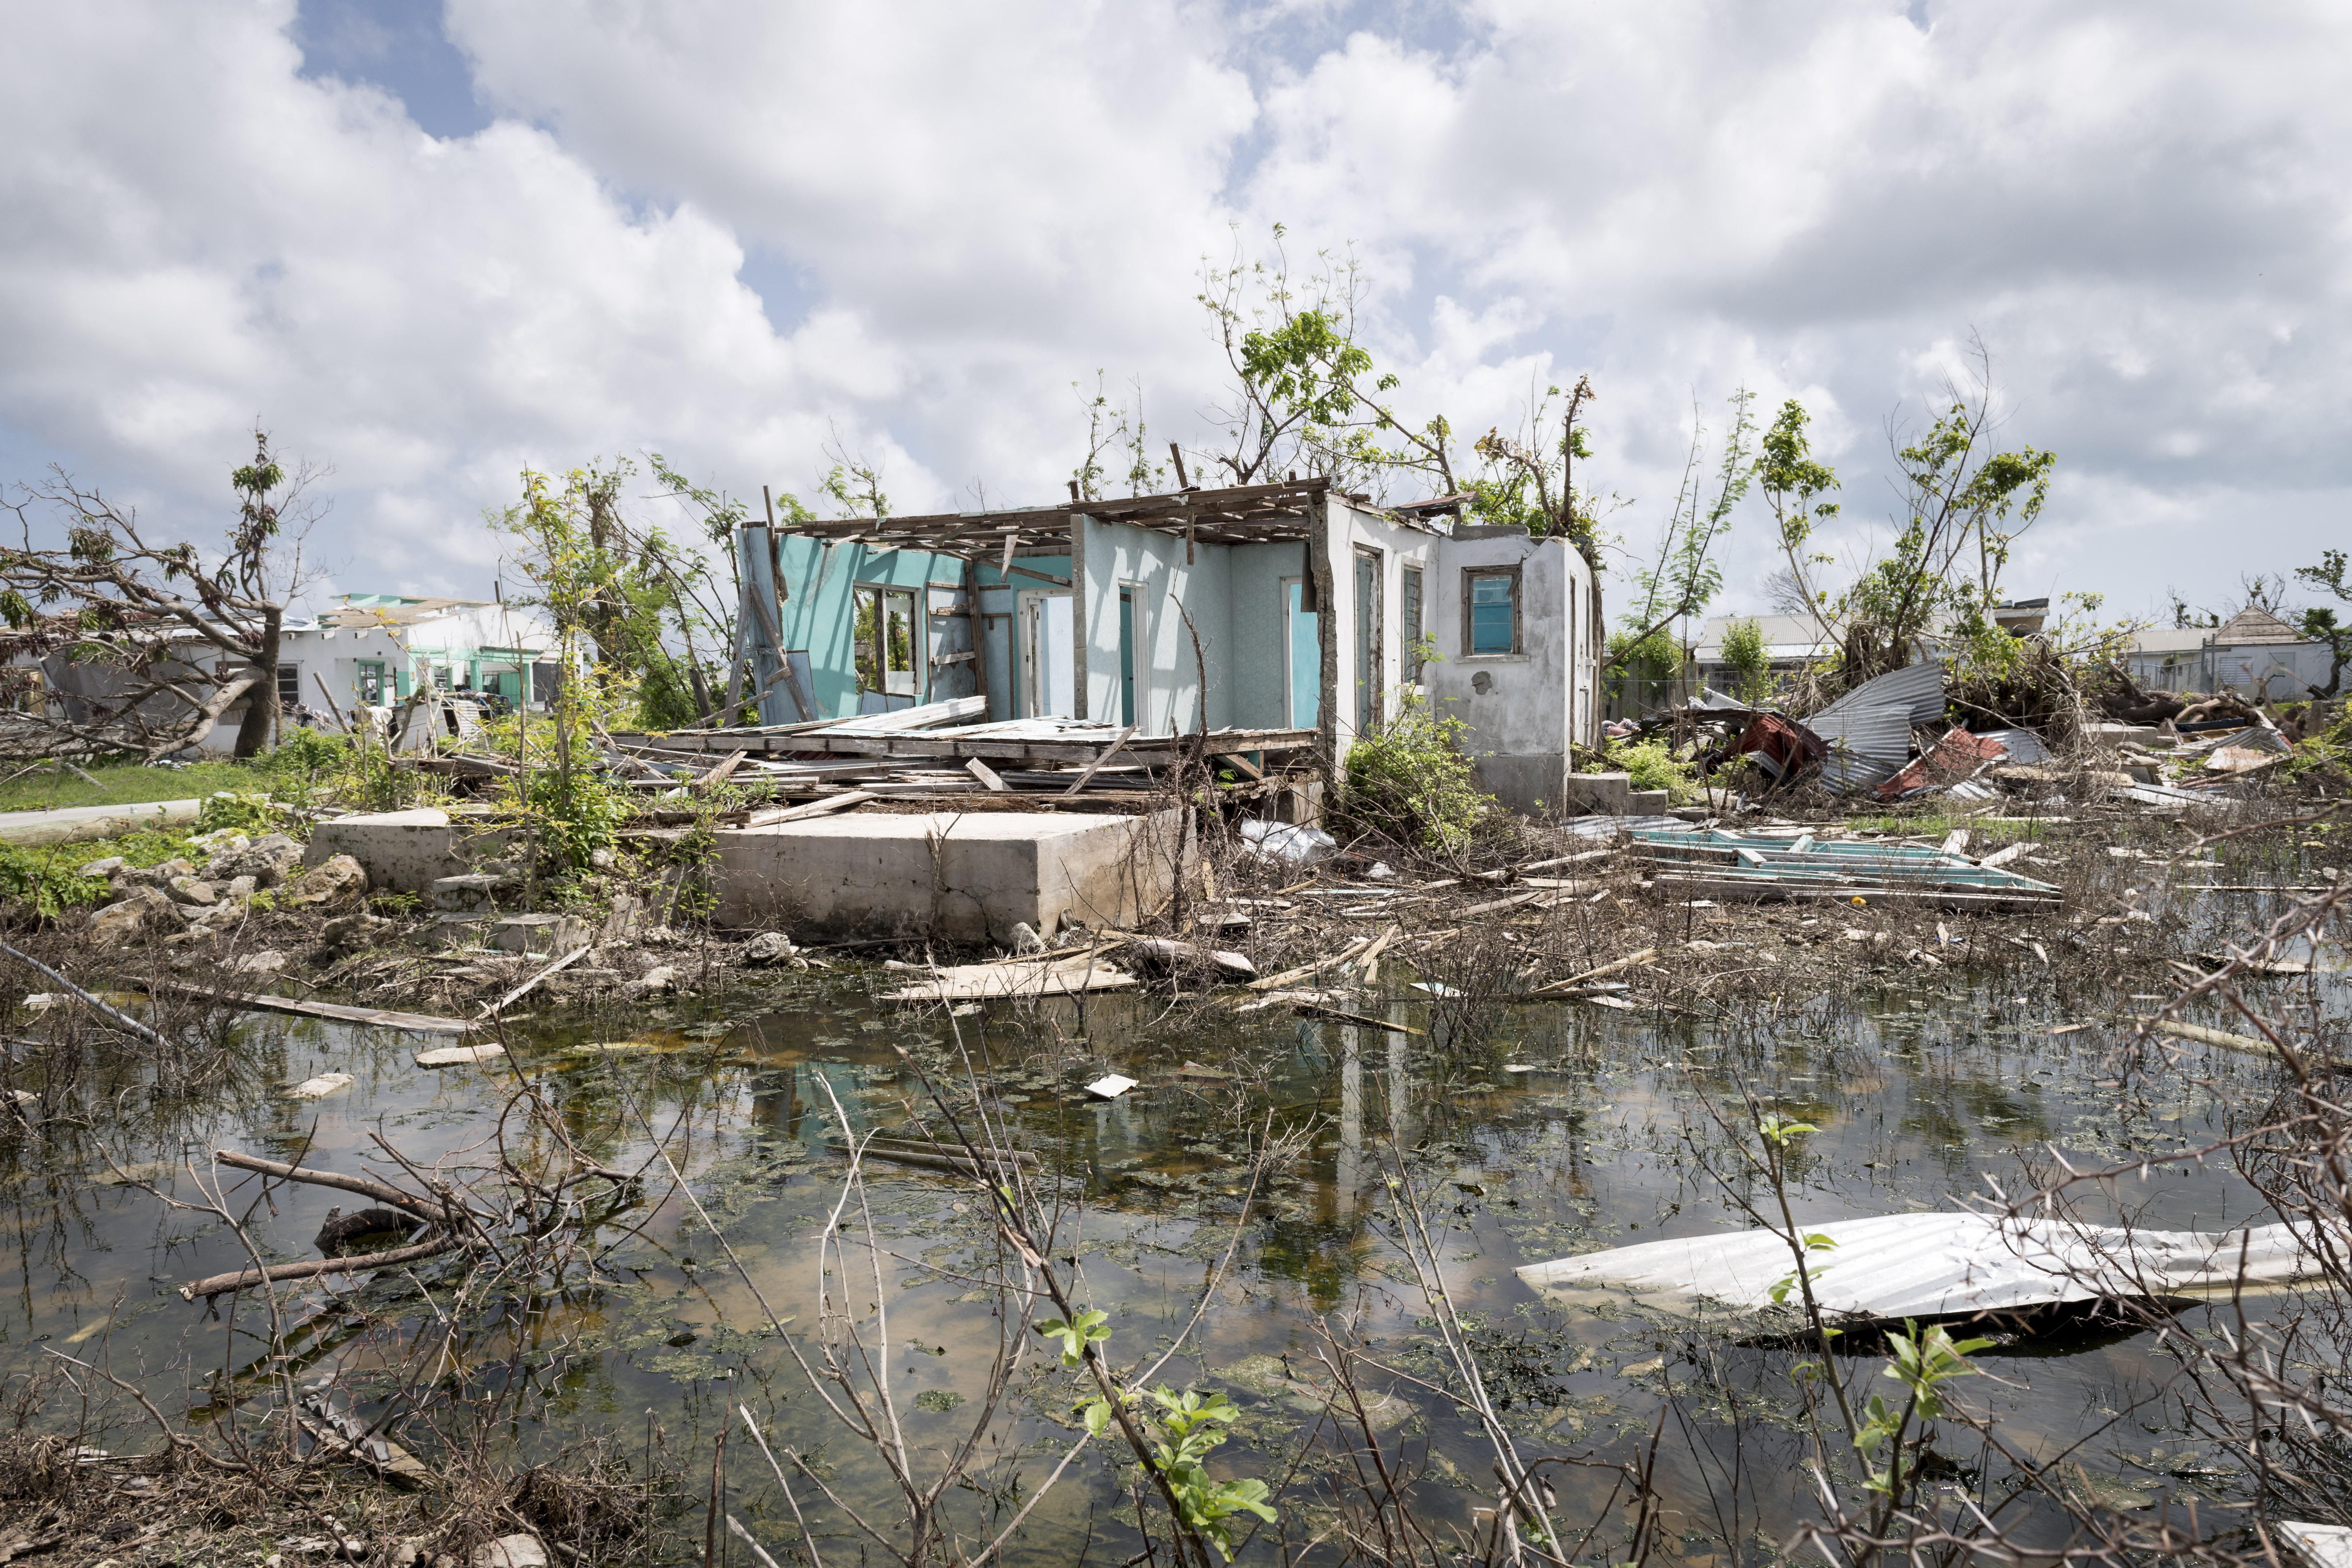 Codrington, Antigua and Barbuda (Photo via UN